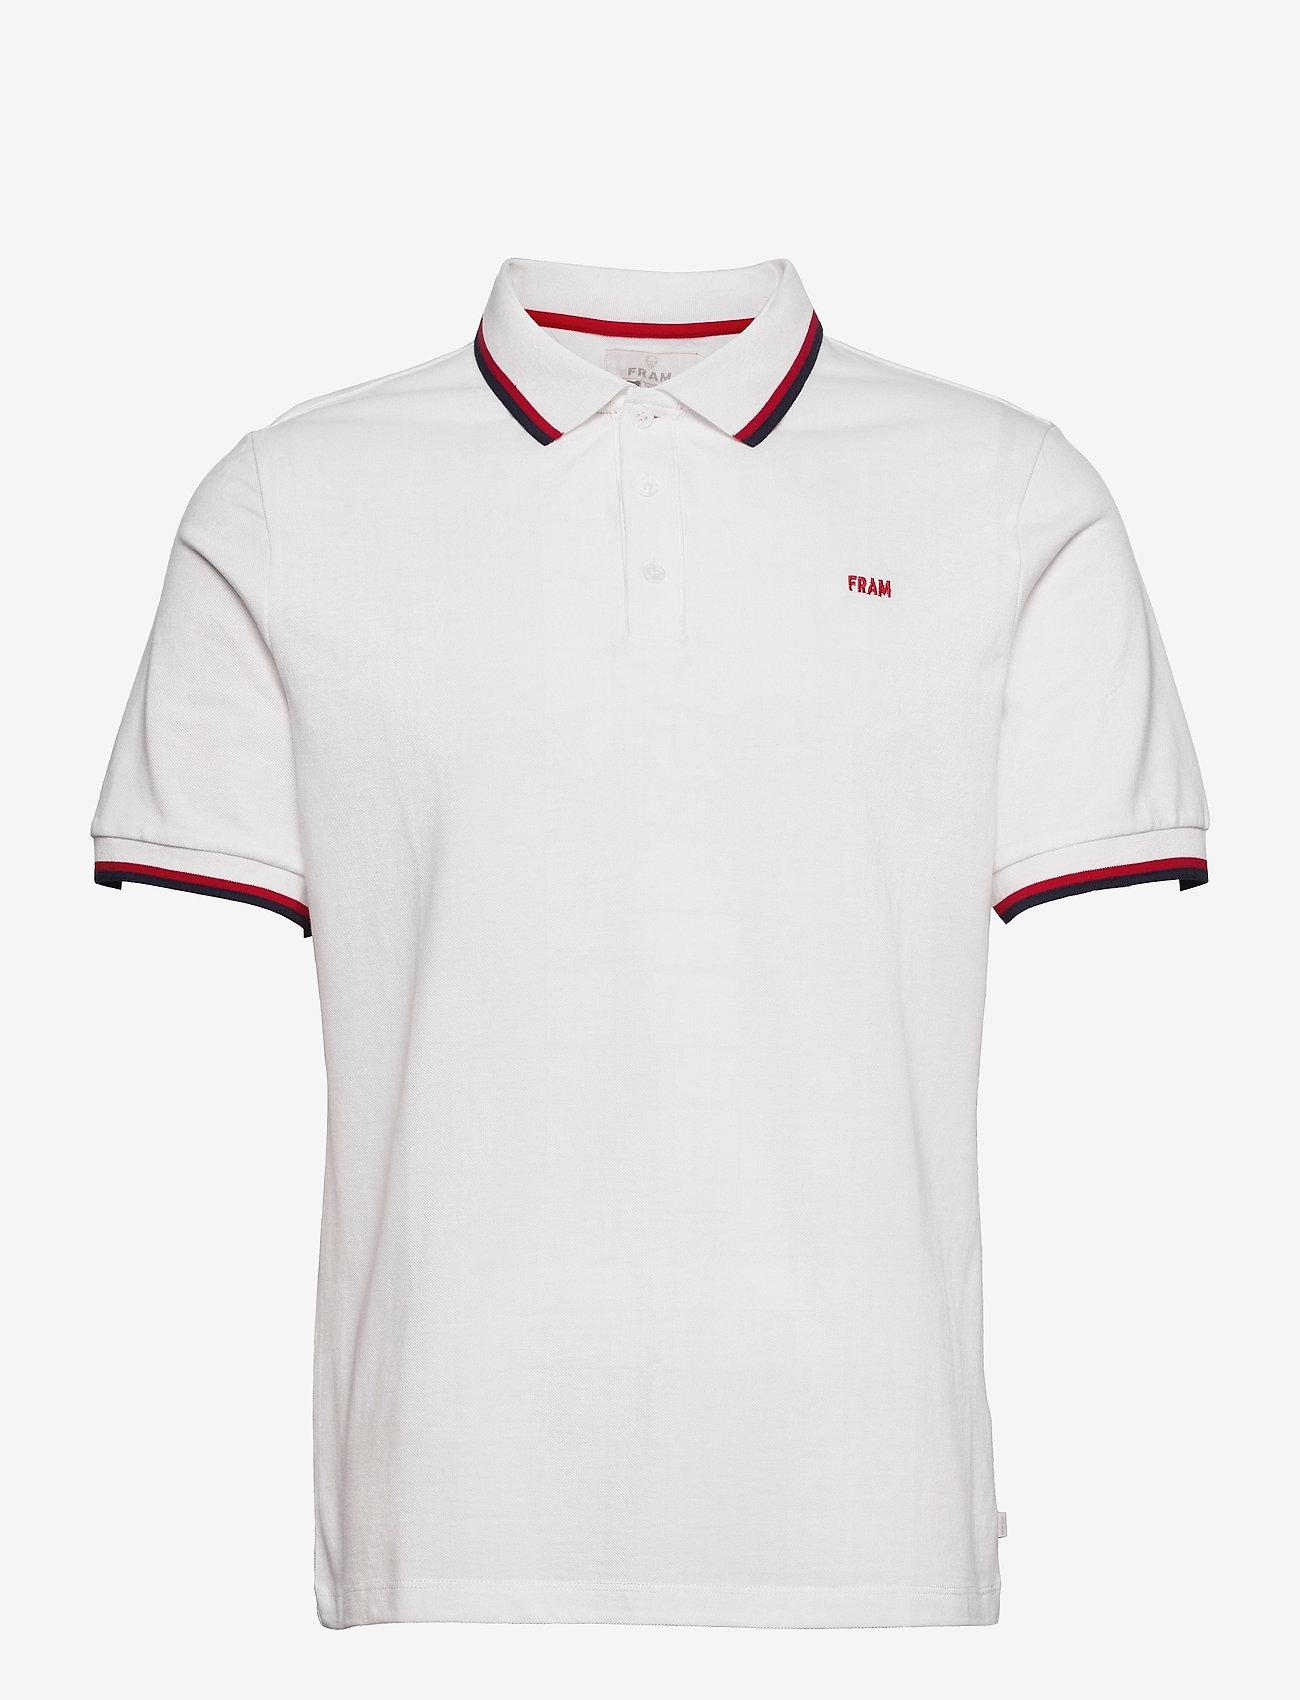 FRAM - Polo Piquet - kurzärmelig - blanc de blanc - 0